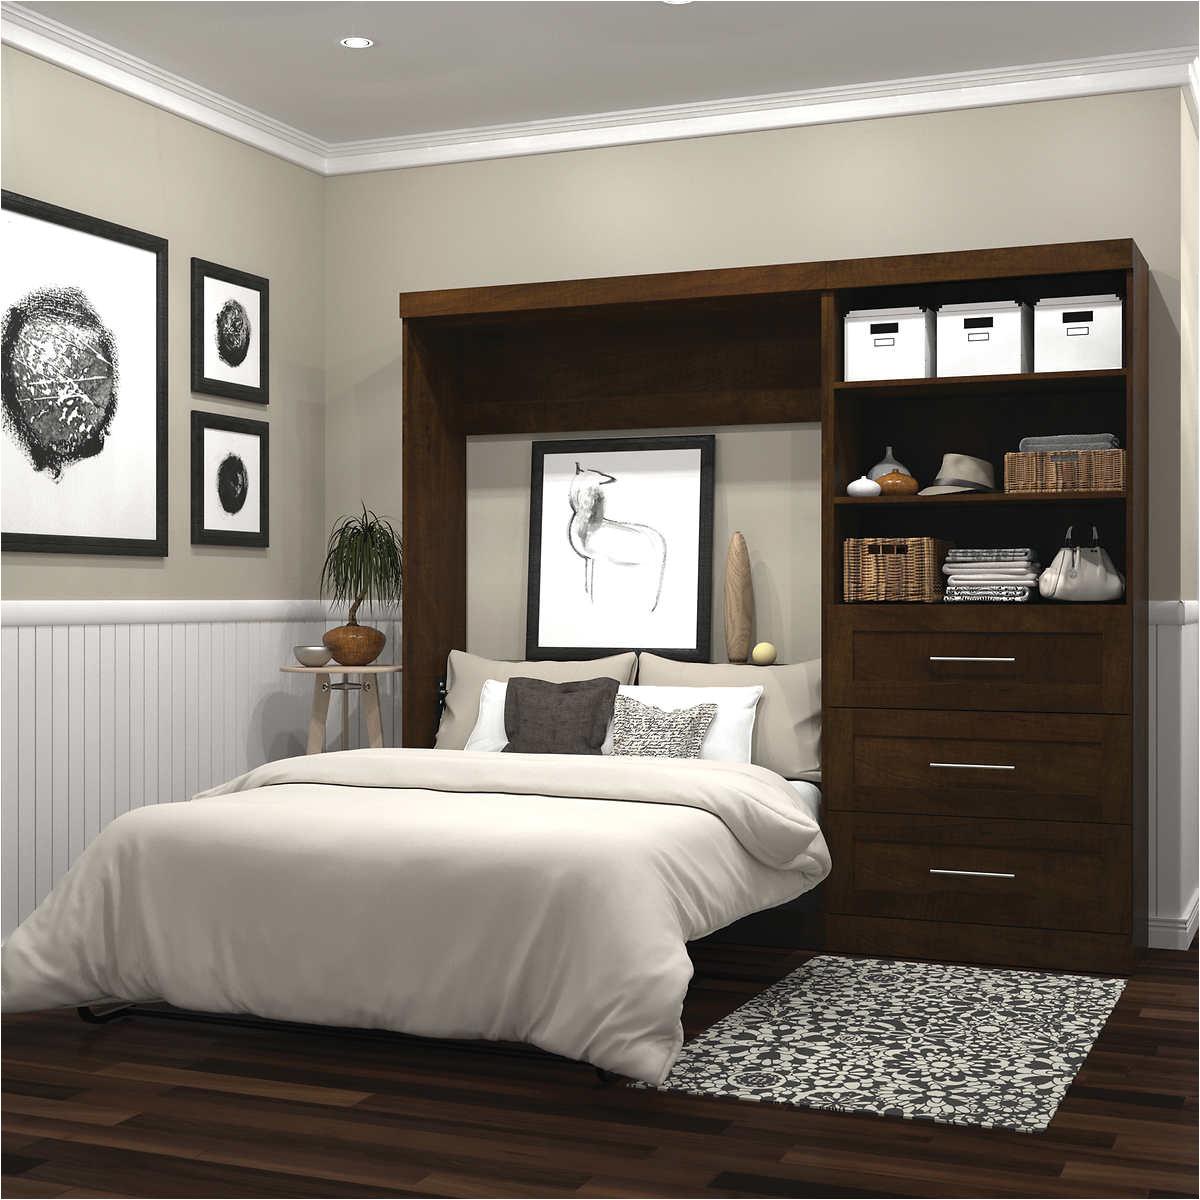 frames ikea hide murphy beds denver houston free bedroom furniture cupboard glass wall storage small space